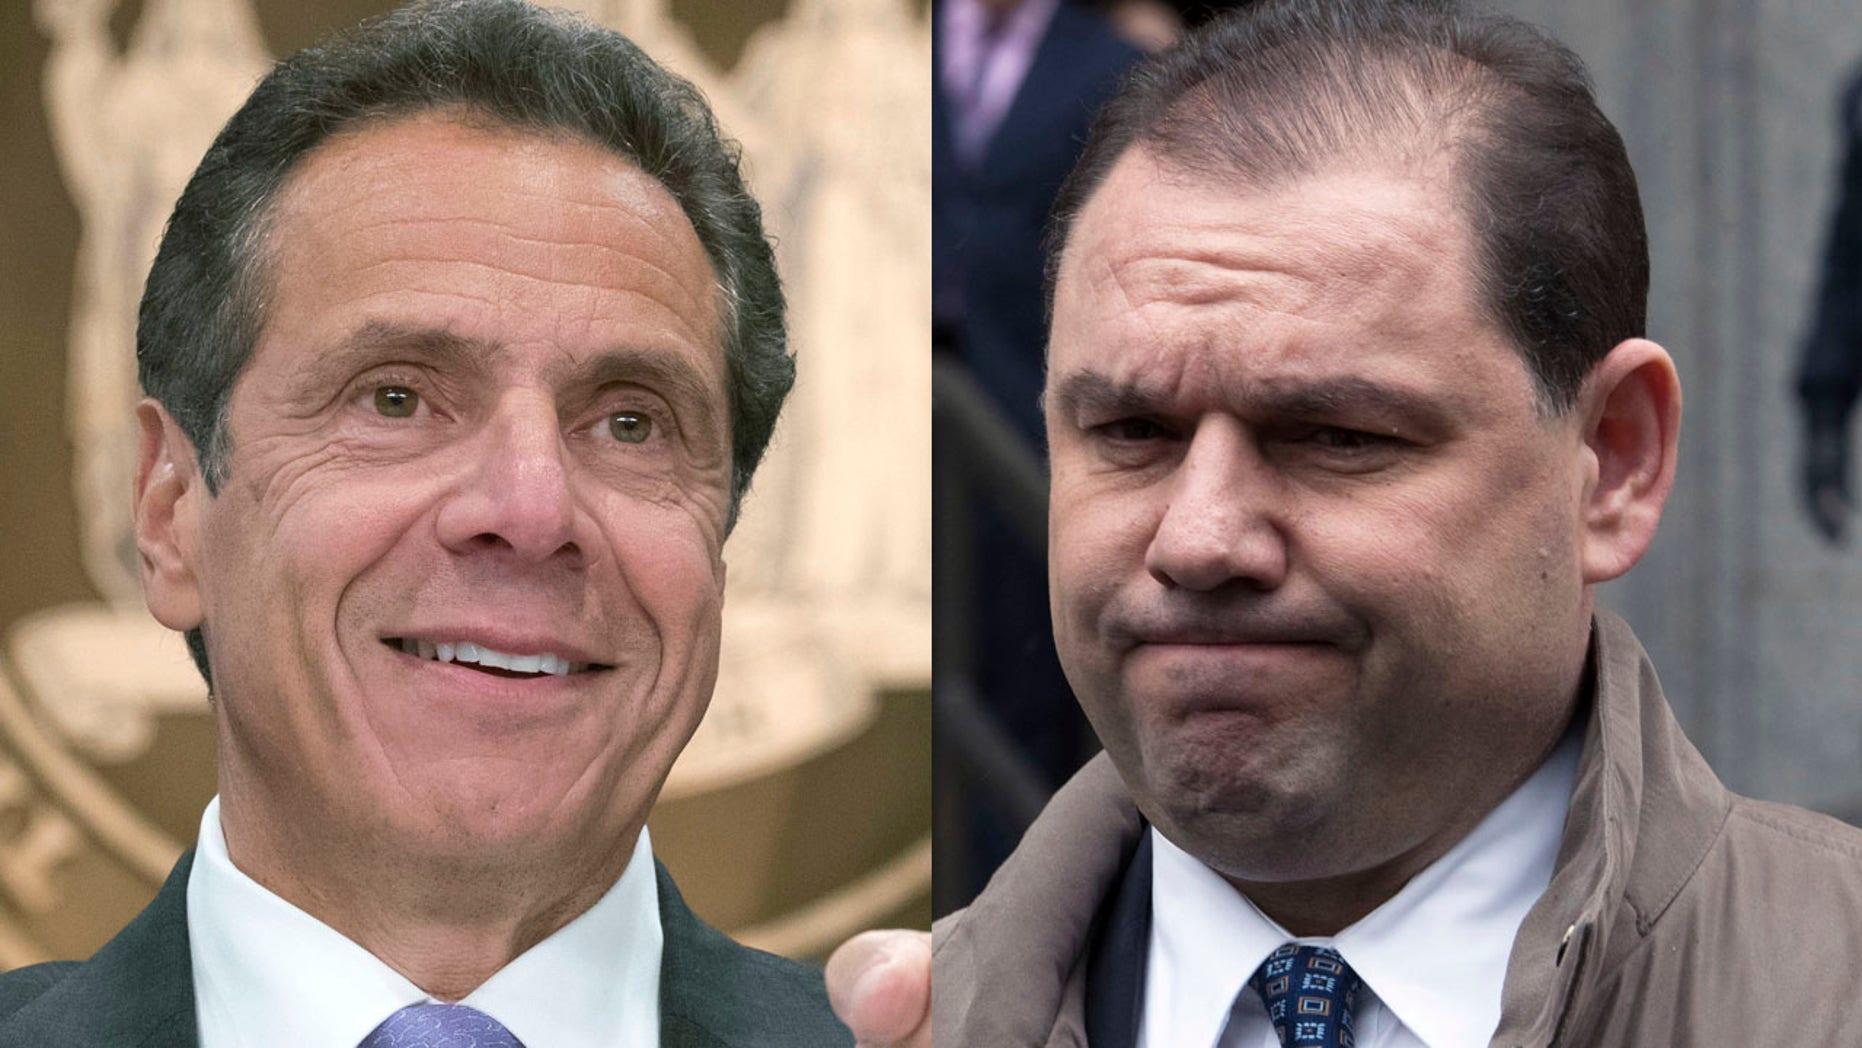 New York Gov. Andrew Cuomo, left, and convicted ex-aide Joseph Percoco.